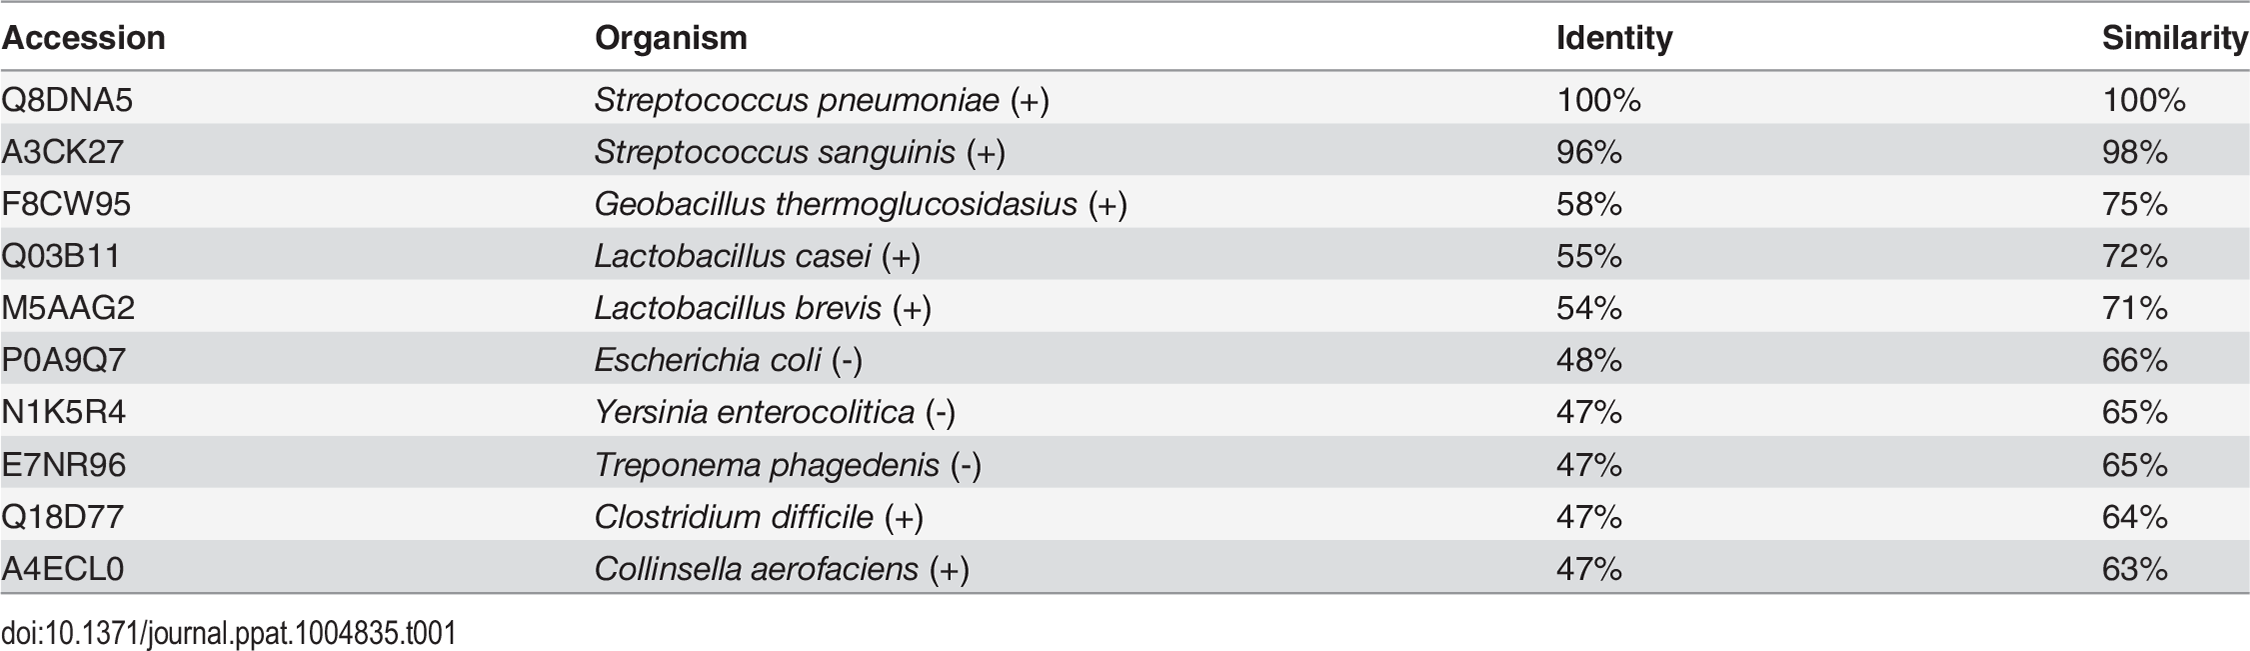 "AdhE sequence conservation in representative Gram-positive (+) and Gram-negative (-) species with confirmed spirosome formation [<em class=""ref"">19</em>–<em class=""ref"">26</em>]."